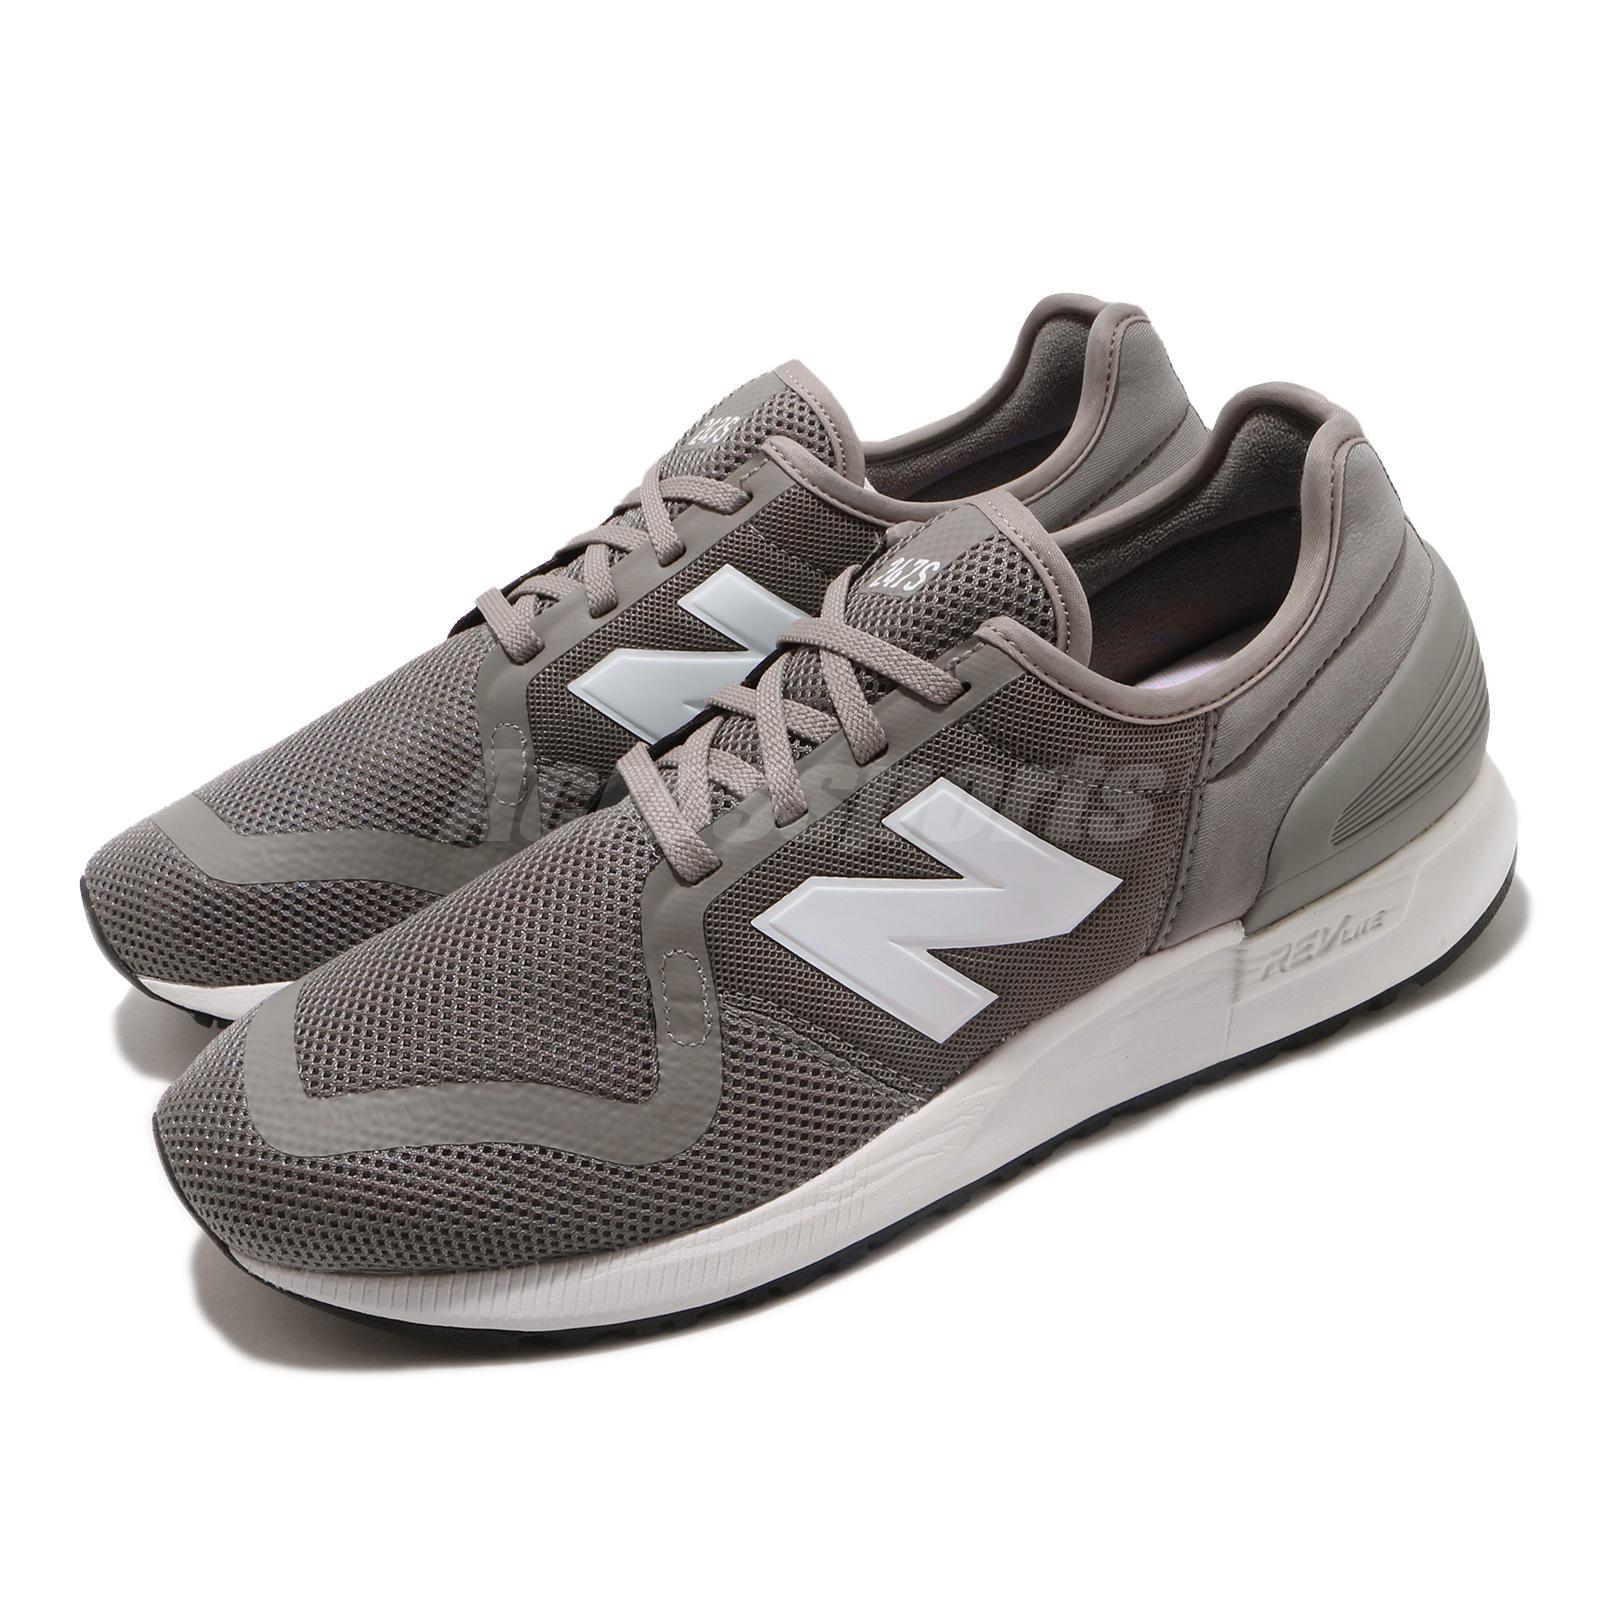 New Balance 247S v3 247 Grey White Men